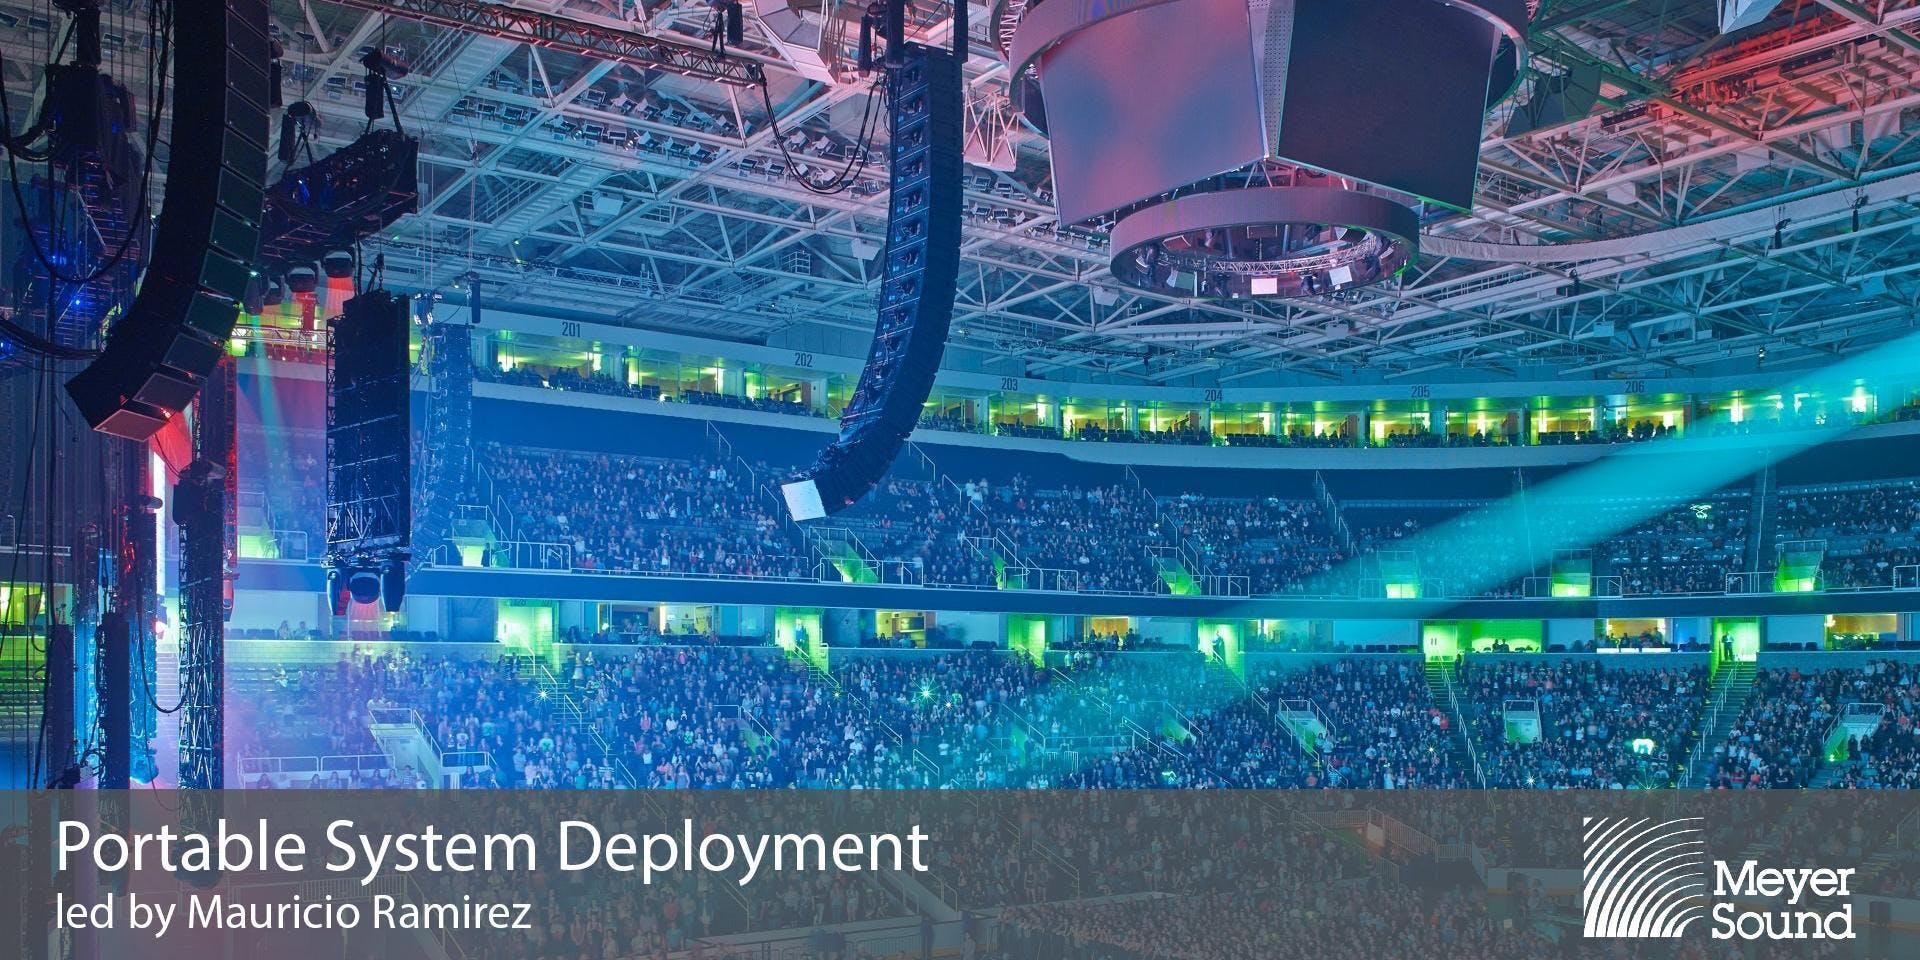 Portable System Deployment | Bangalore 2018